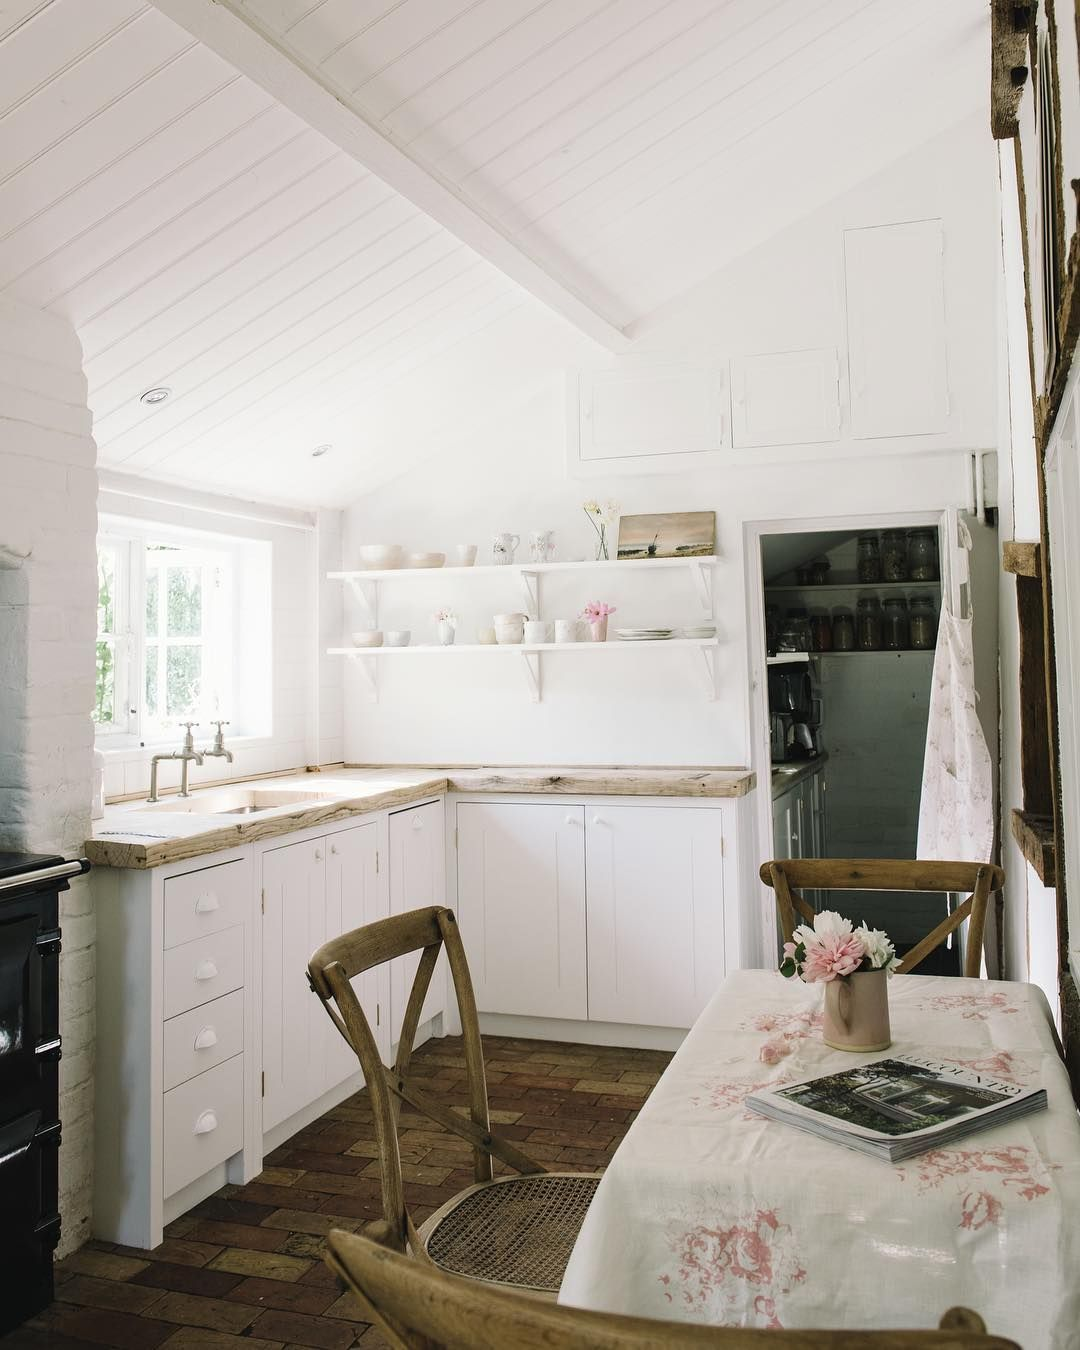 5 x 8 badezimmer design-ideen  stupefying useful tips feminine minimalist bedroom rugs feminine